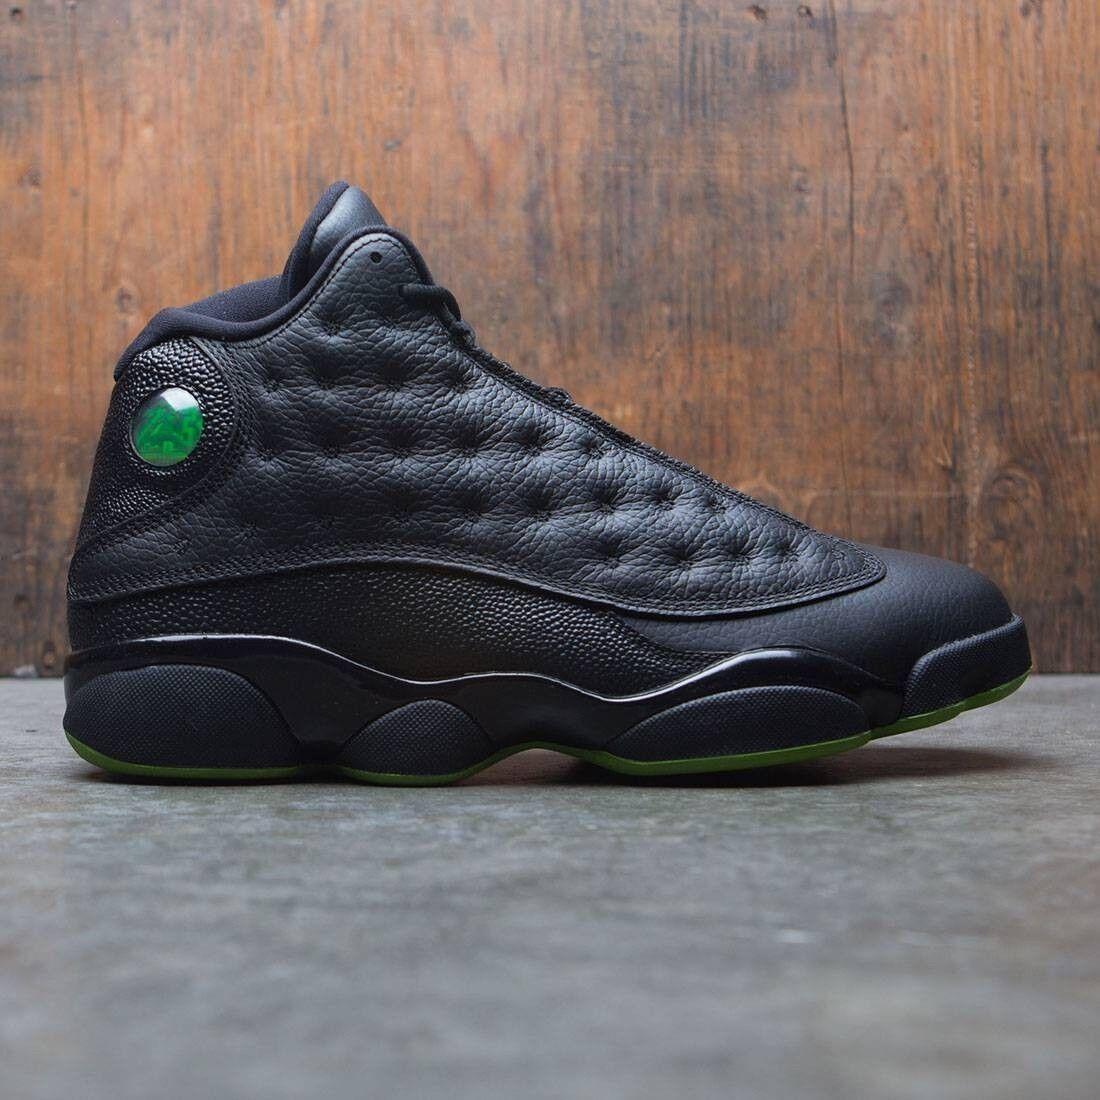 Nike Air Jordan 13 XIII Retro Altitude Black Green Size 9. 414571-042